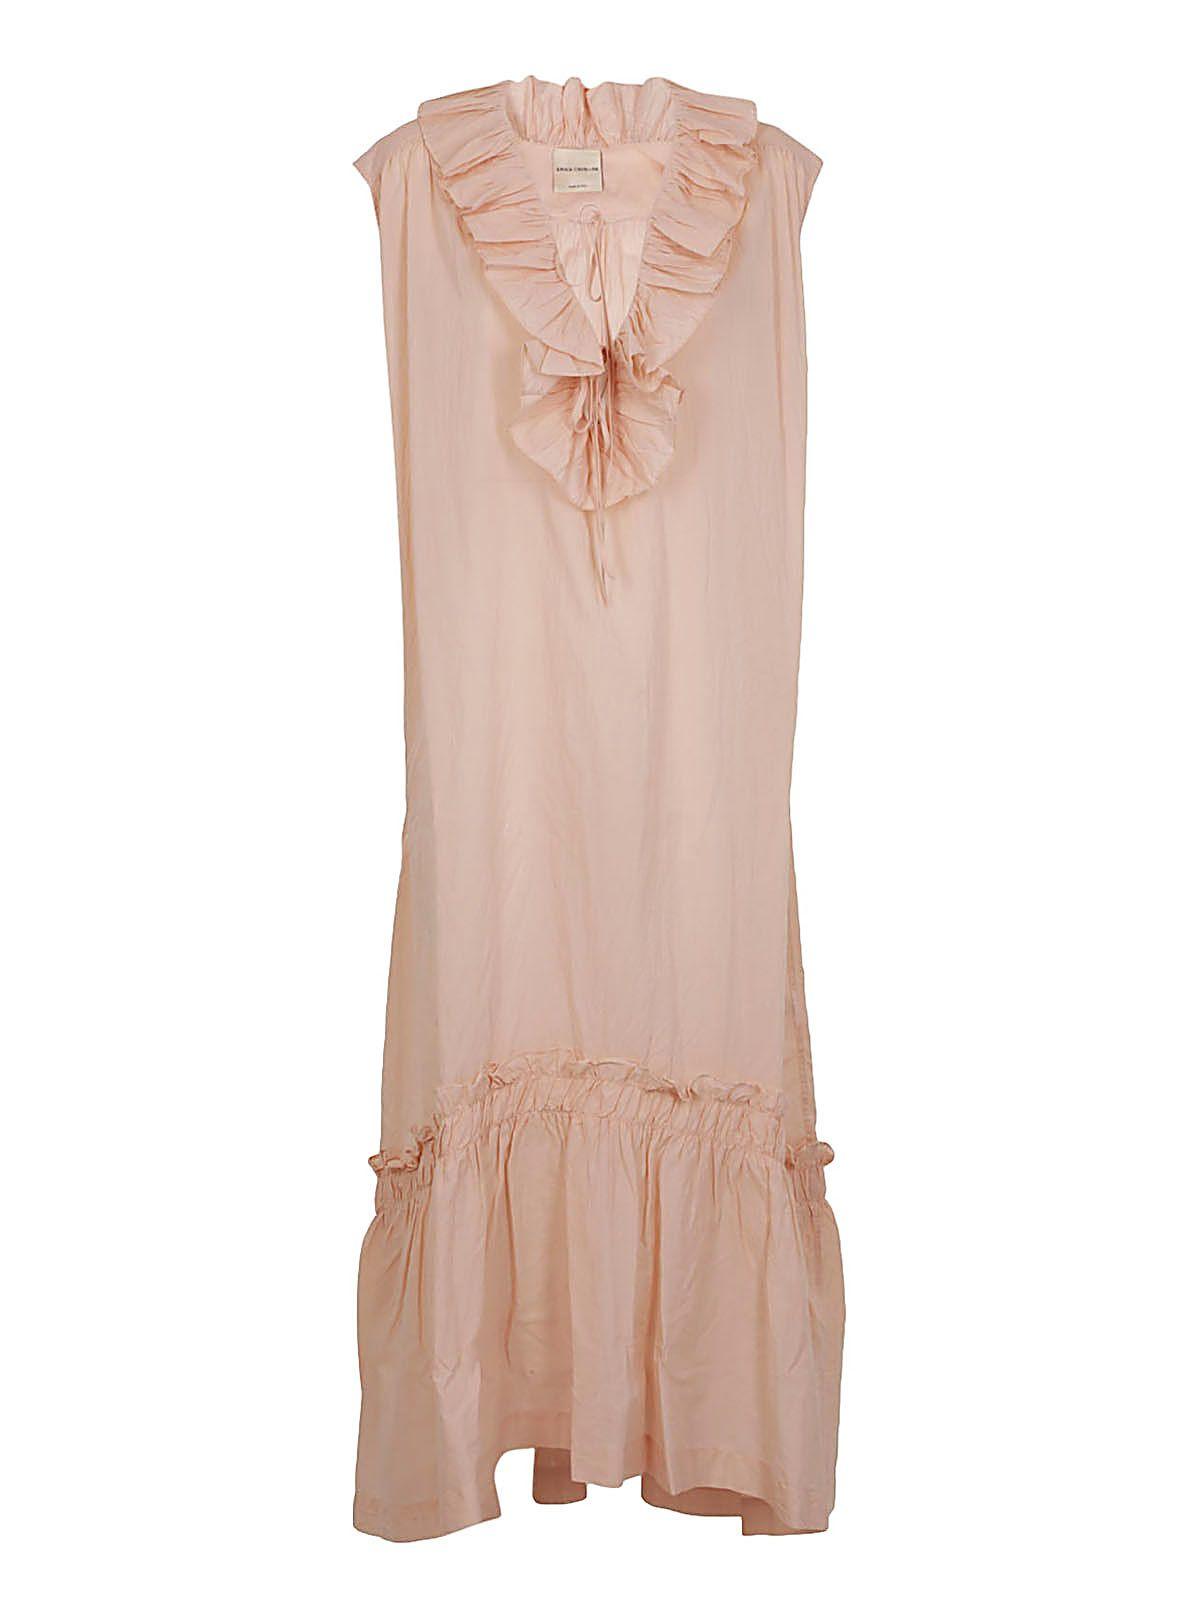 Erika Cavallini Ruffled Dress 10553080